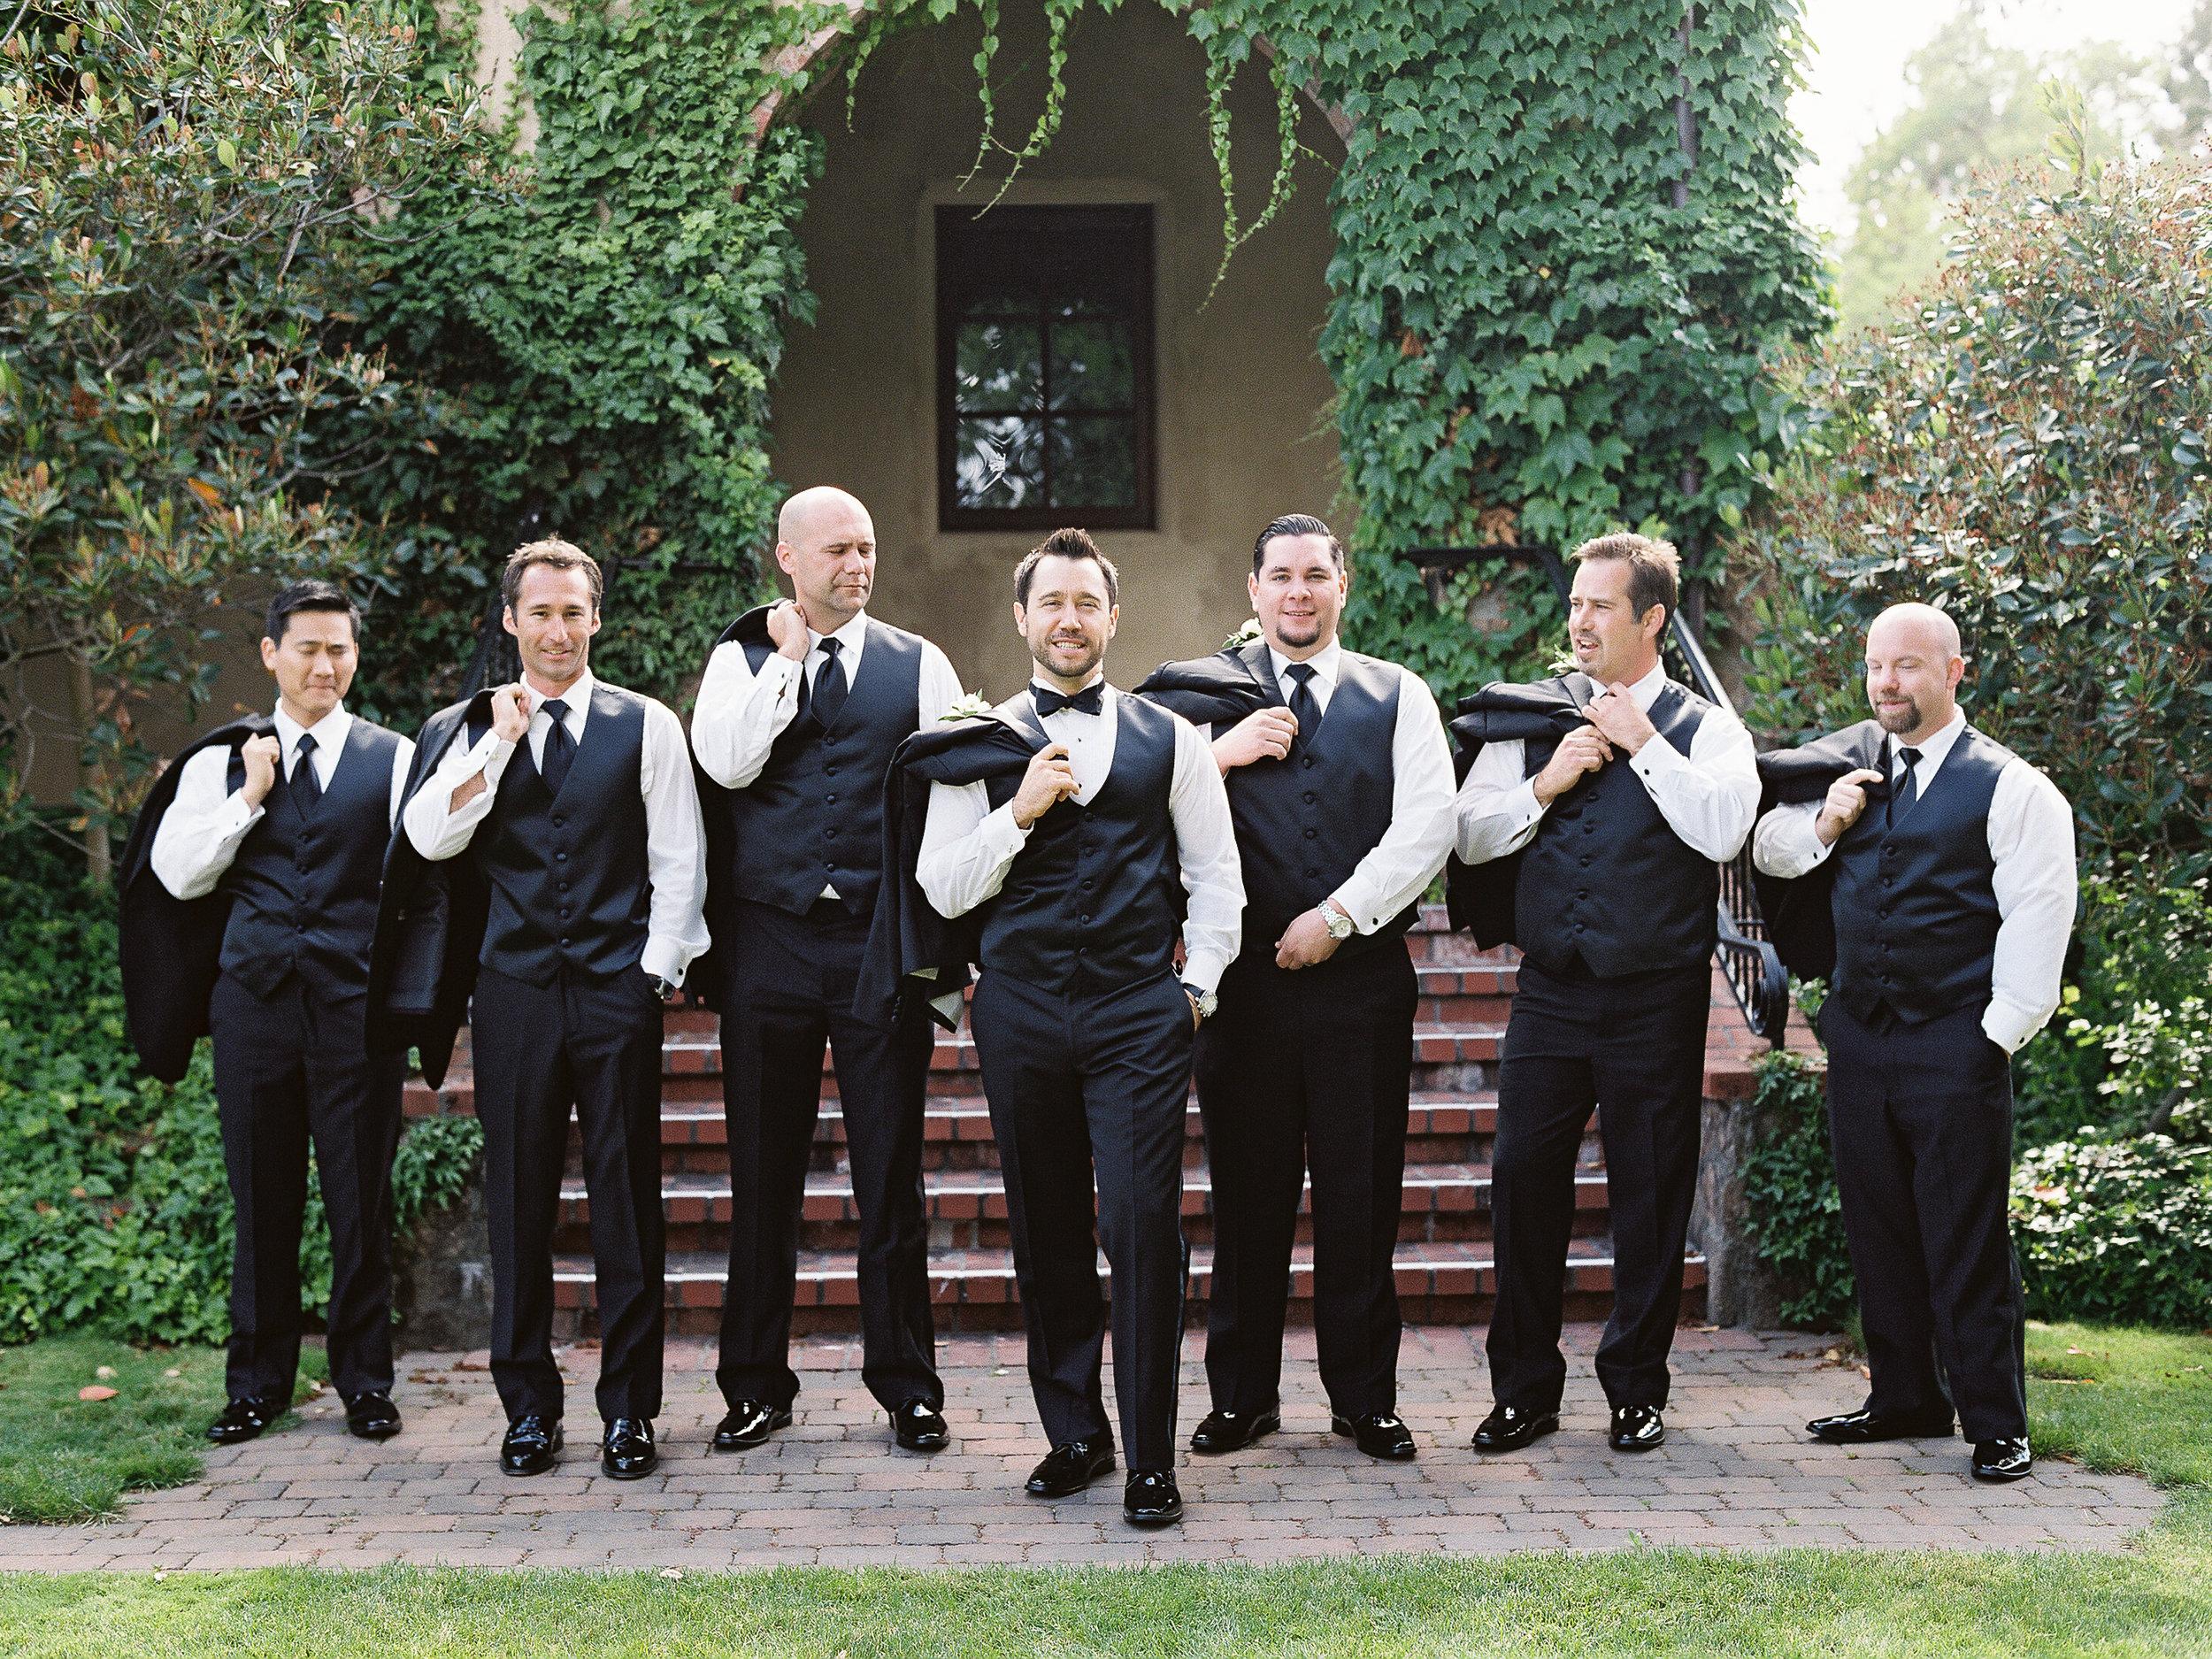 Meghan Mehan Photography   Fine Art Film Wedding Photographer   California   San Francisco   Napa   Sonoma   Santa Barbara   Big Sur   Destination Wedding Photographer 038.jpg